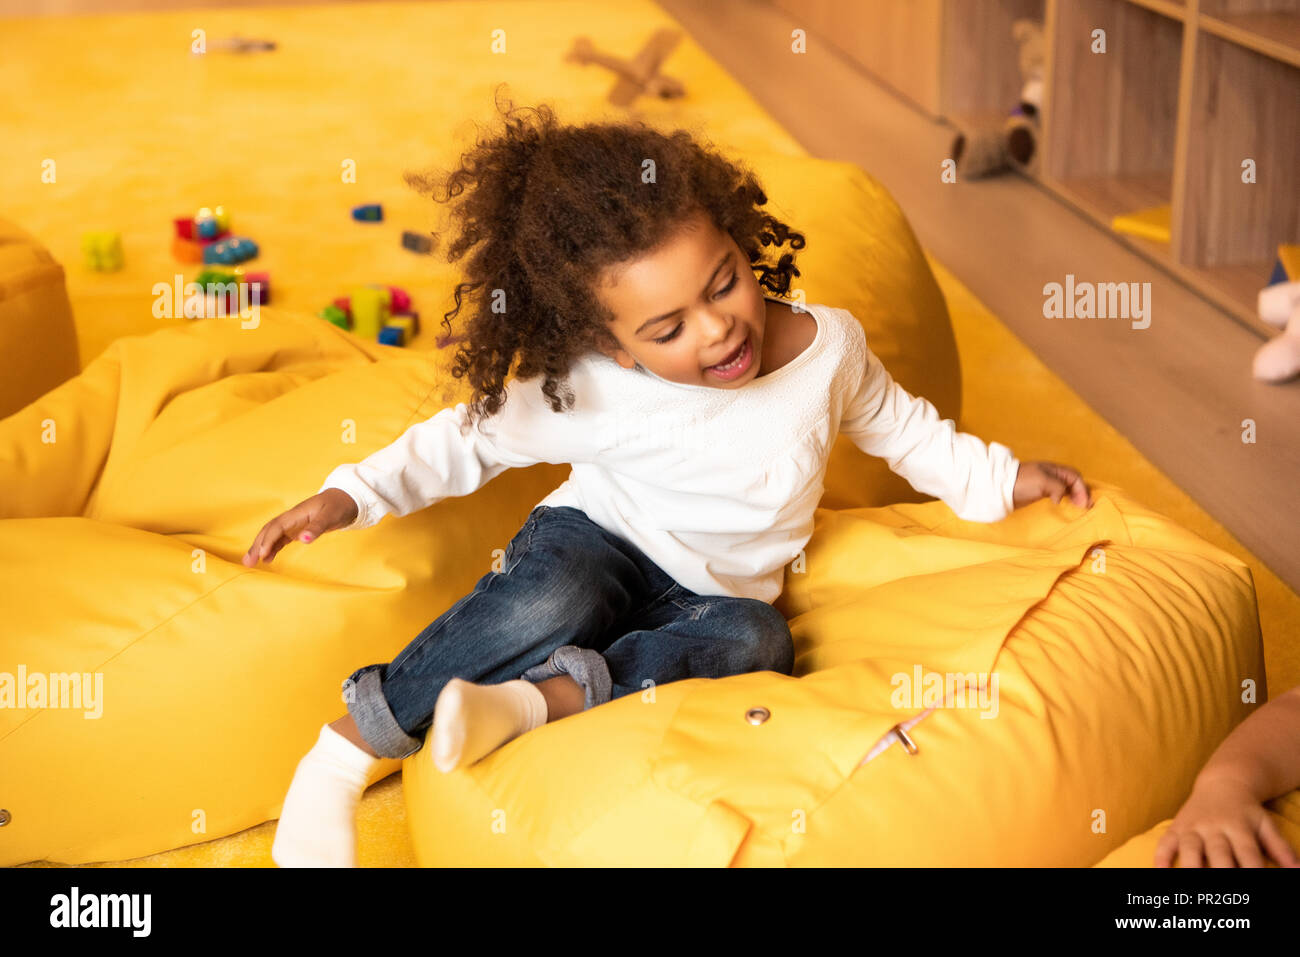 adorable african american kid sitting on bean bag chair in kindergarten - Stock Image